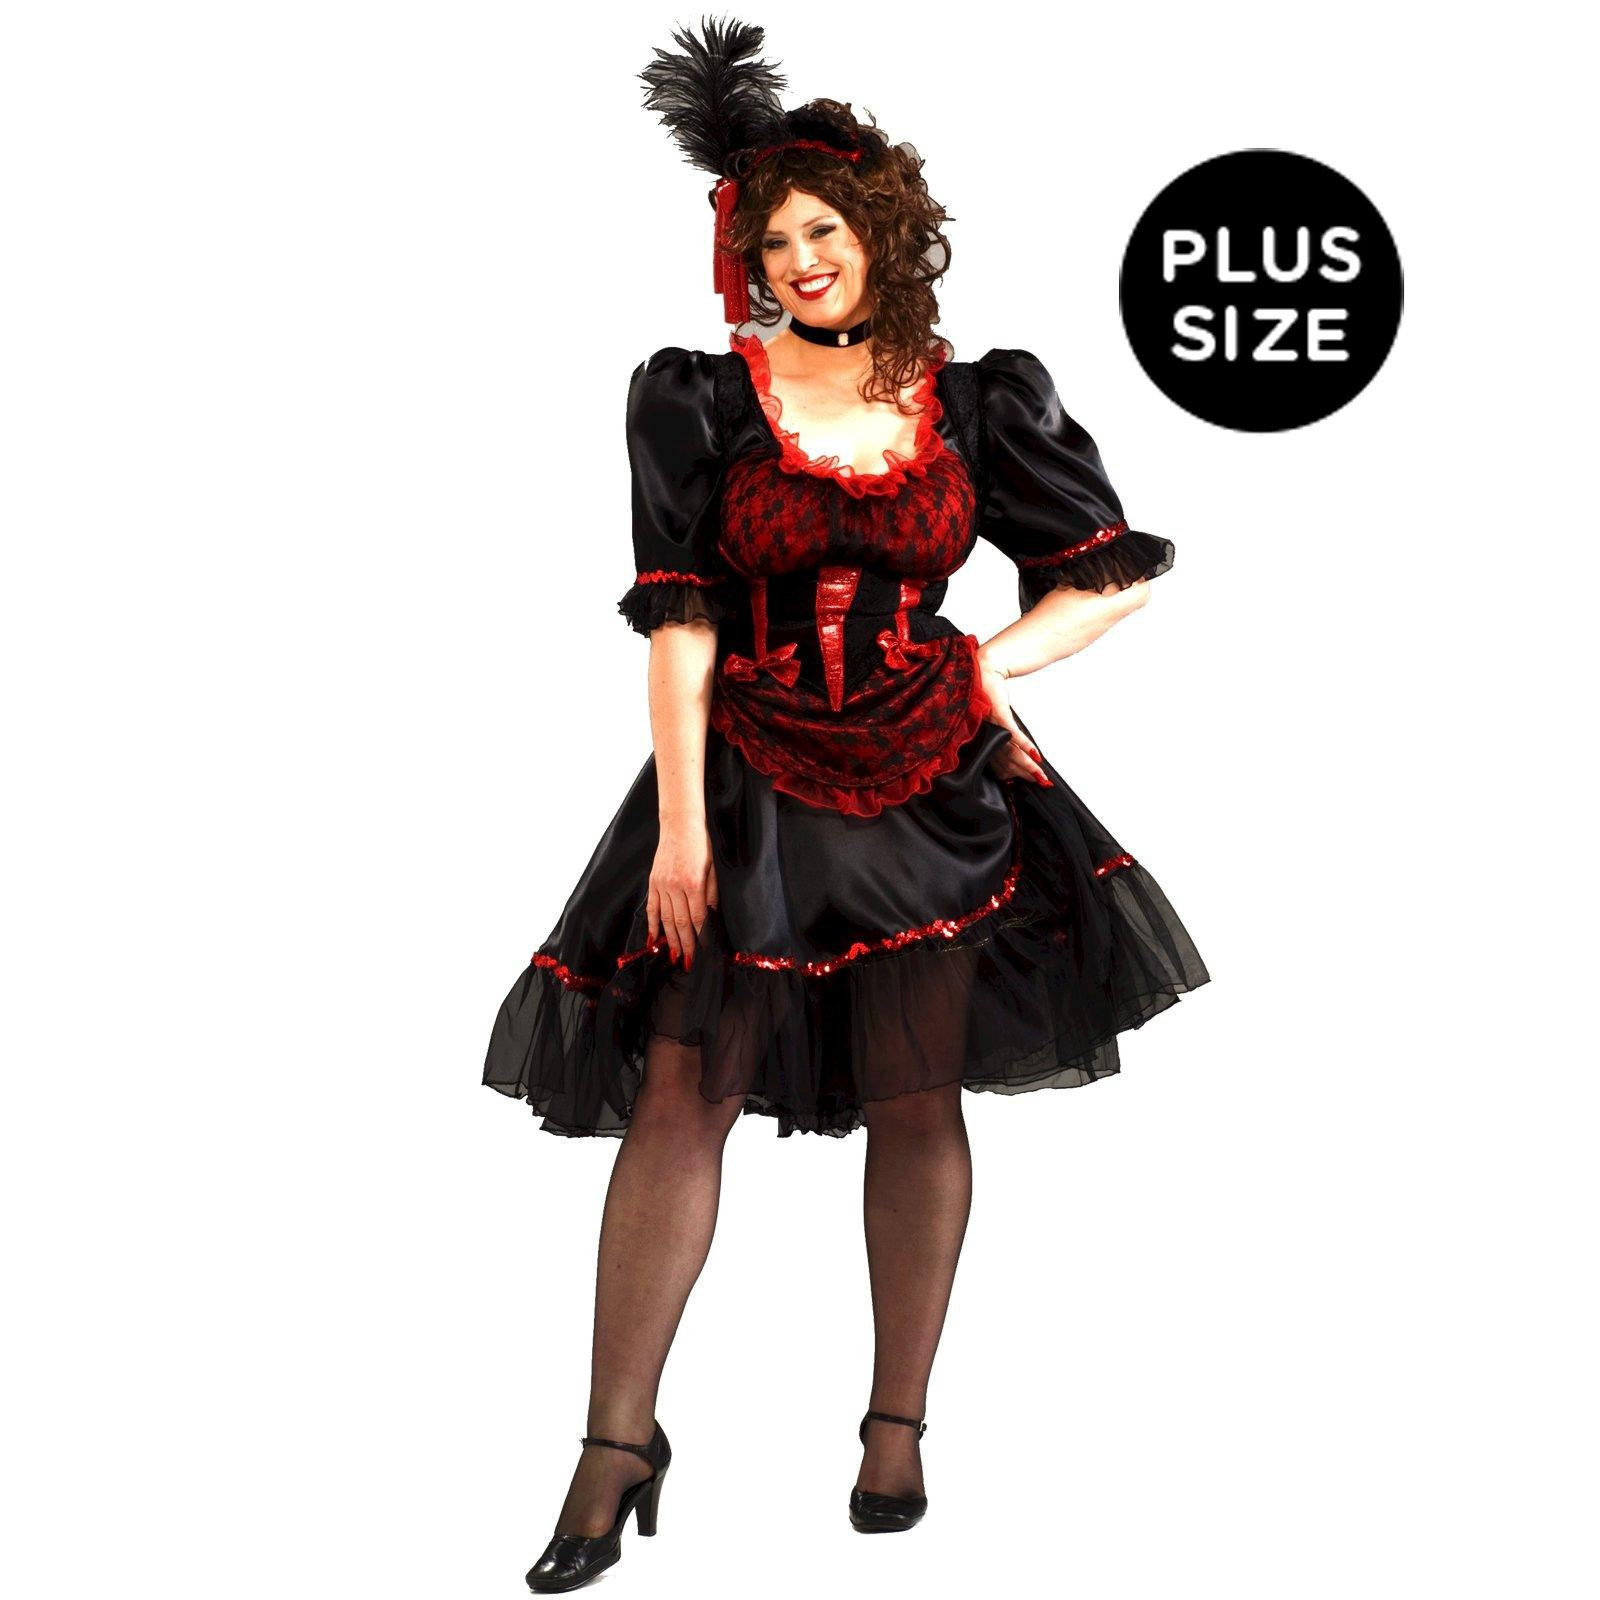 Saloon Girl Adult Plus Costume : BuyCostumes.com